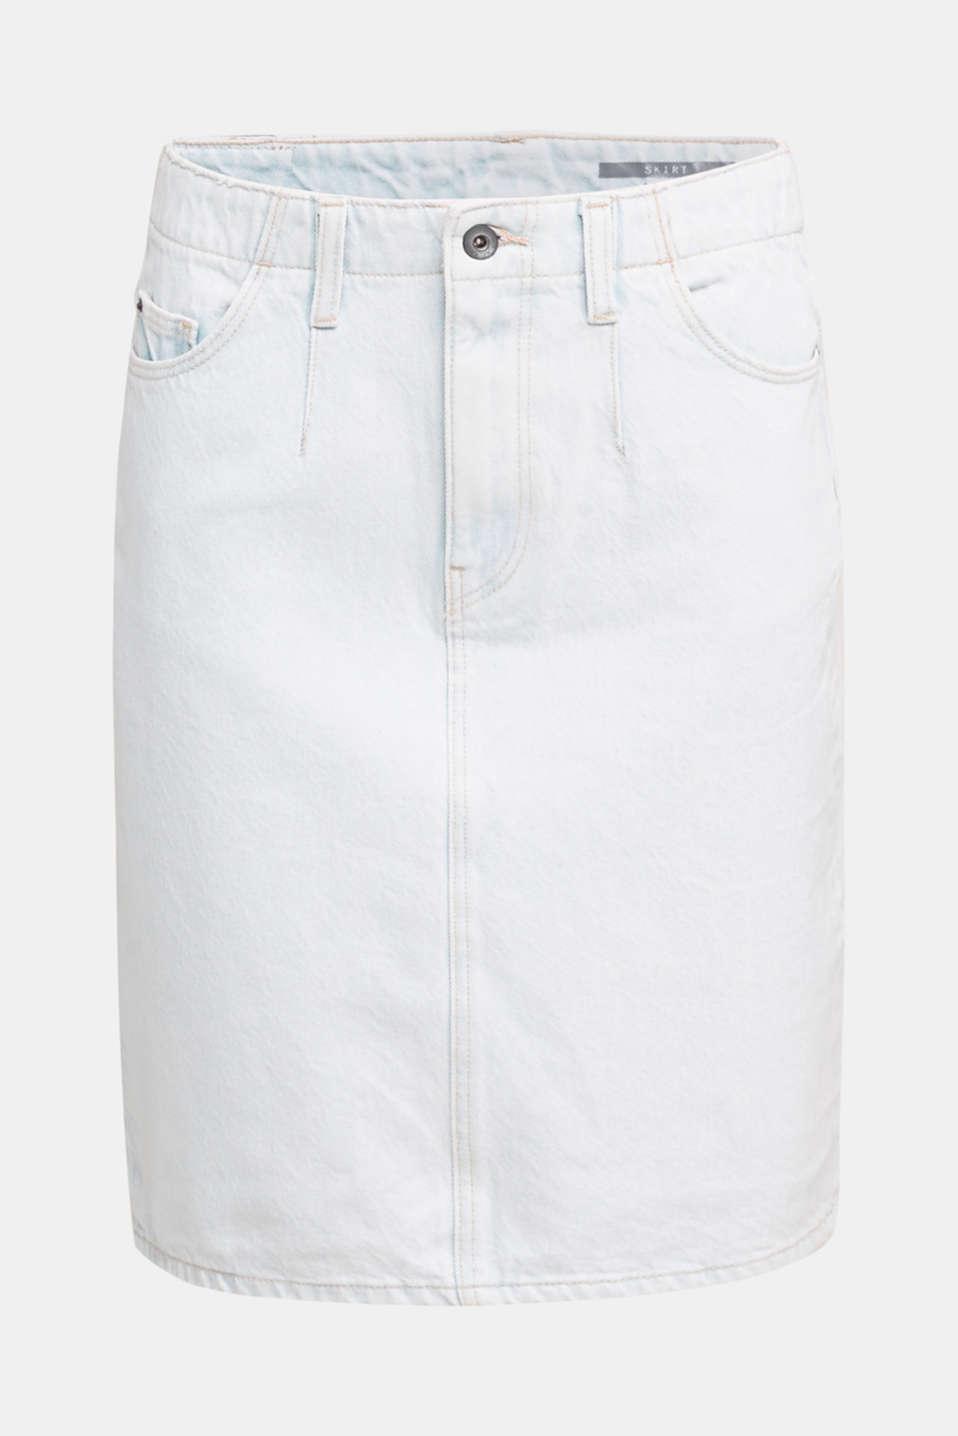 Denim skirt in 100% cotton, BLUE BLEACHED, detail image number 6